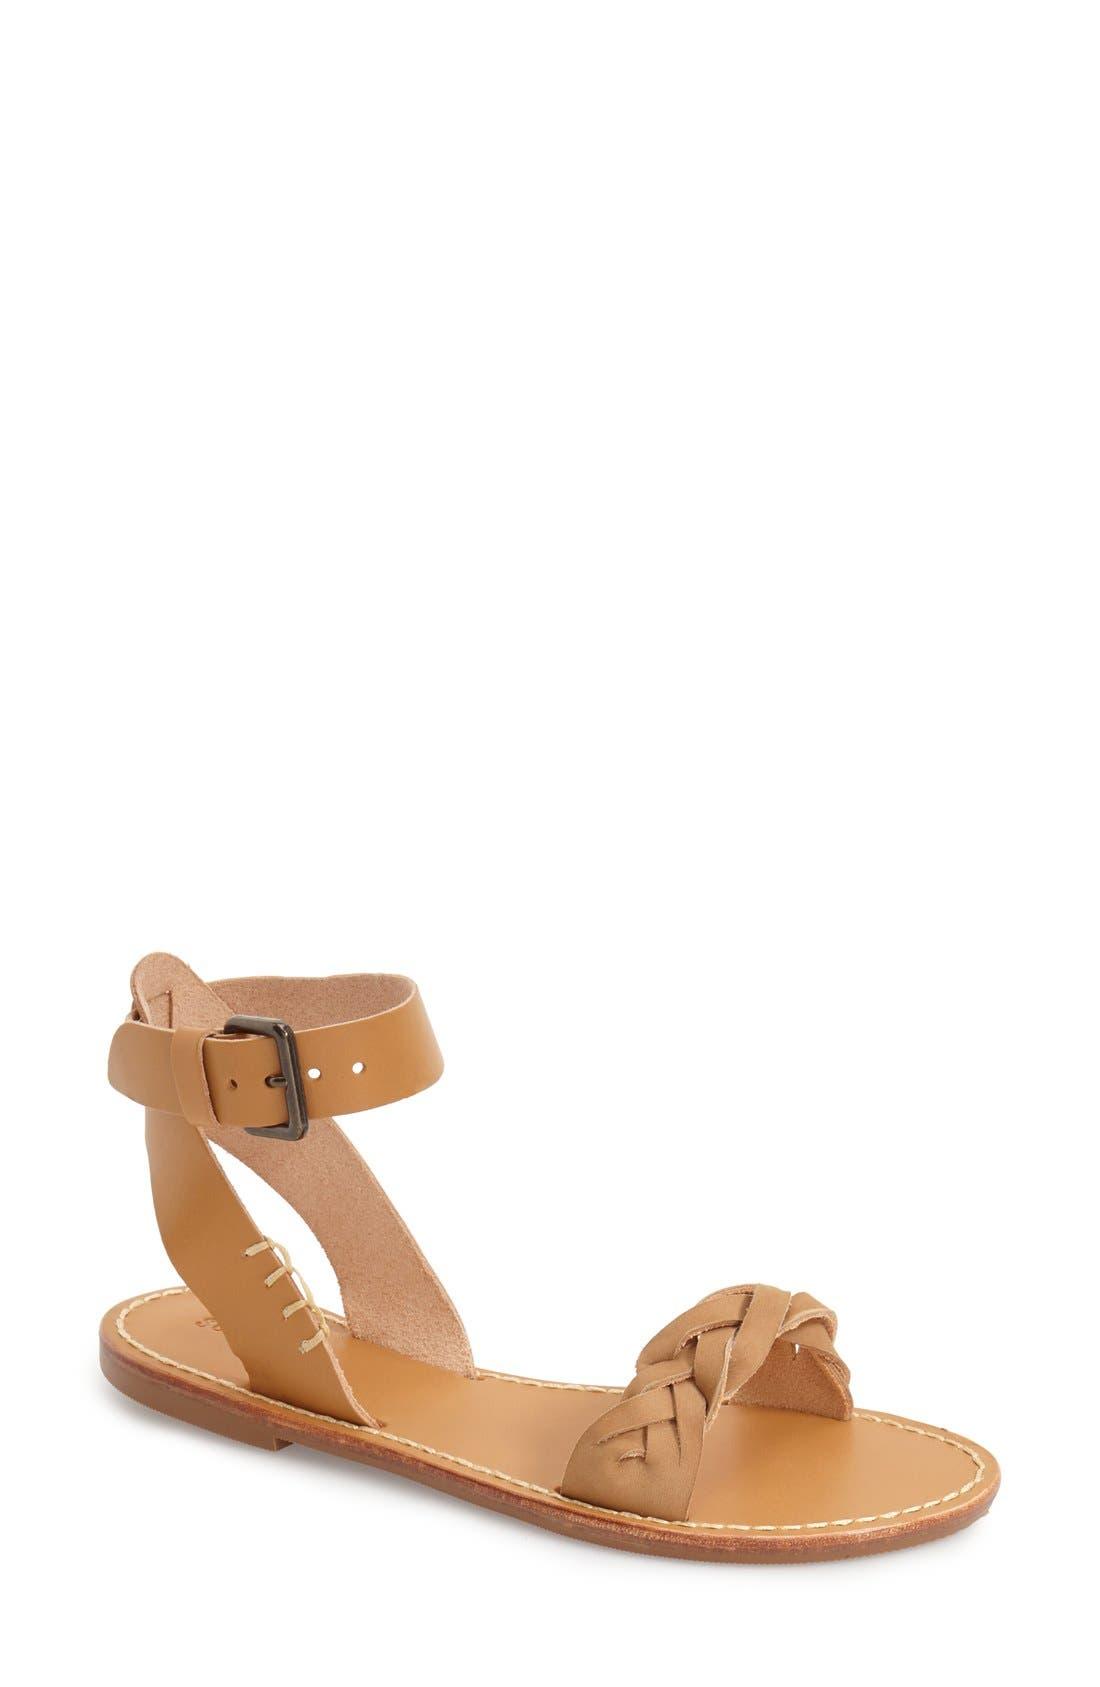 Ankle Strap Sandal, Main, color, 282